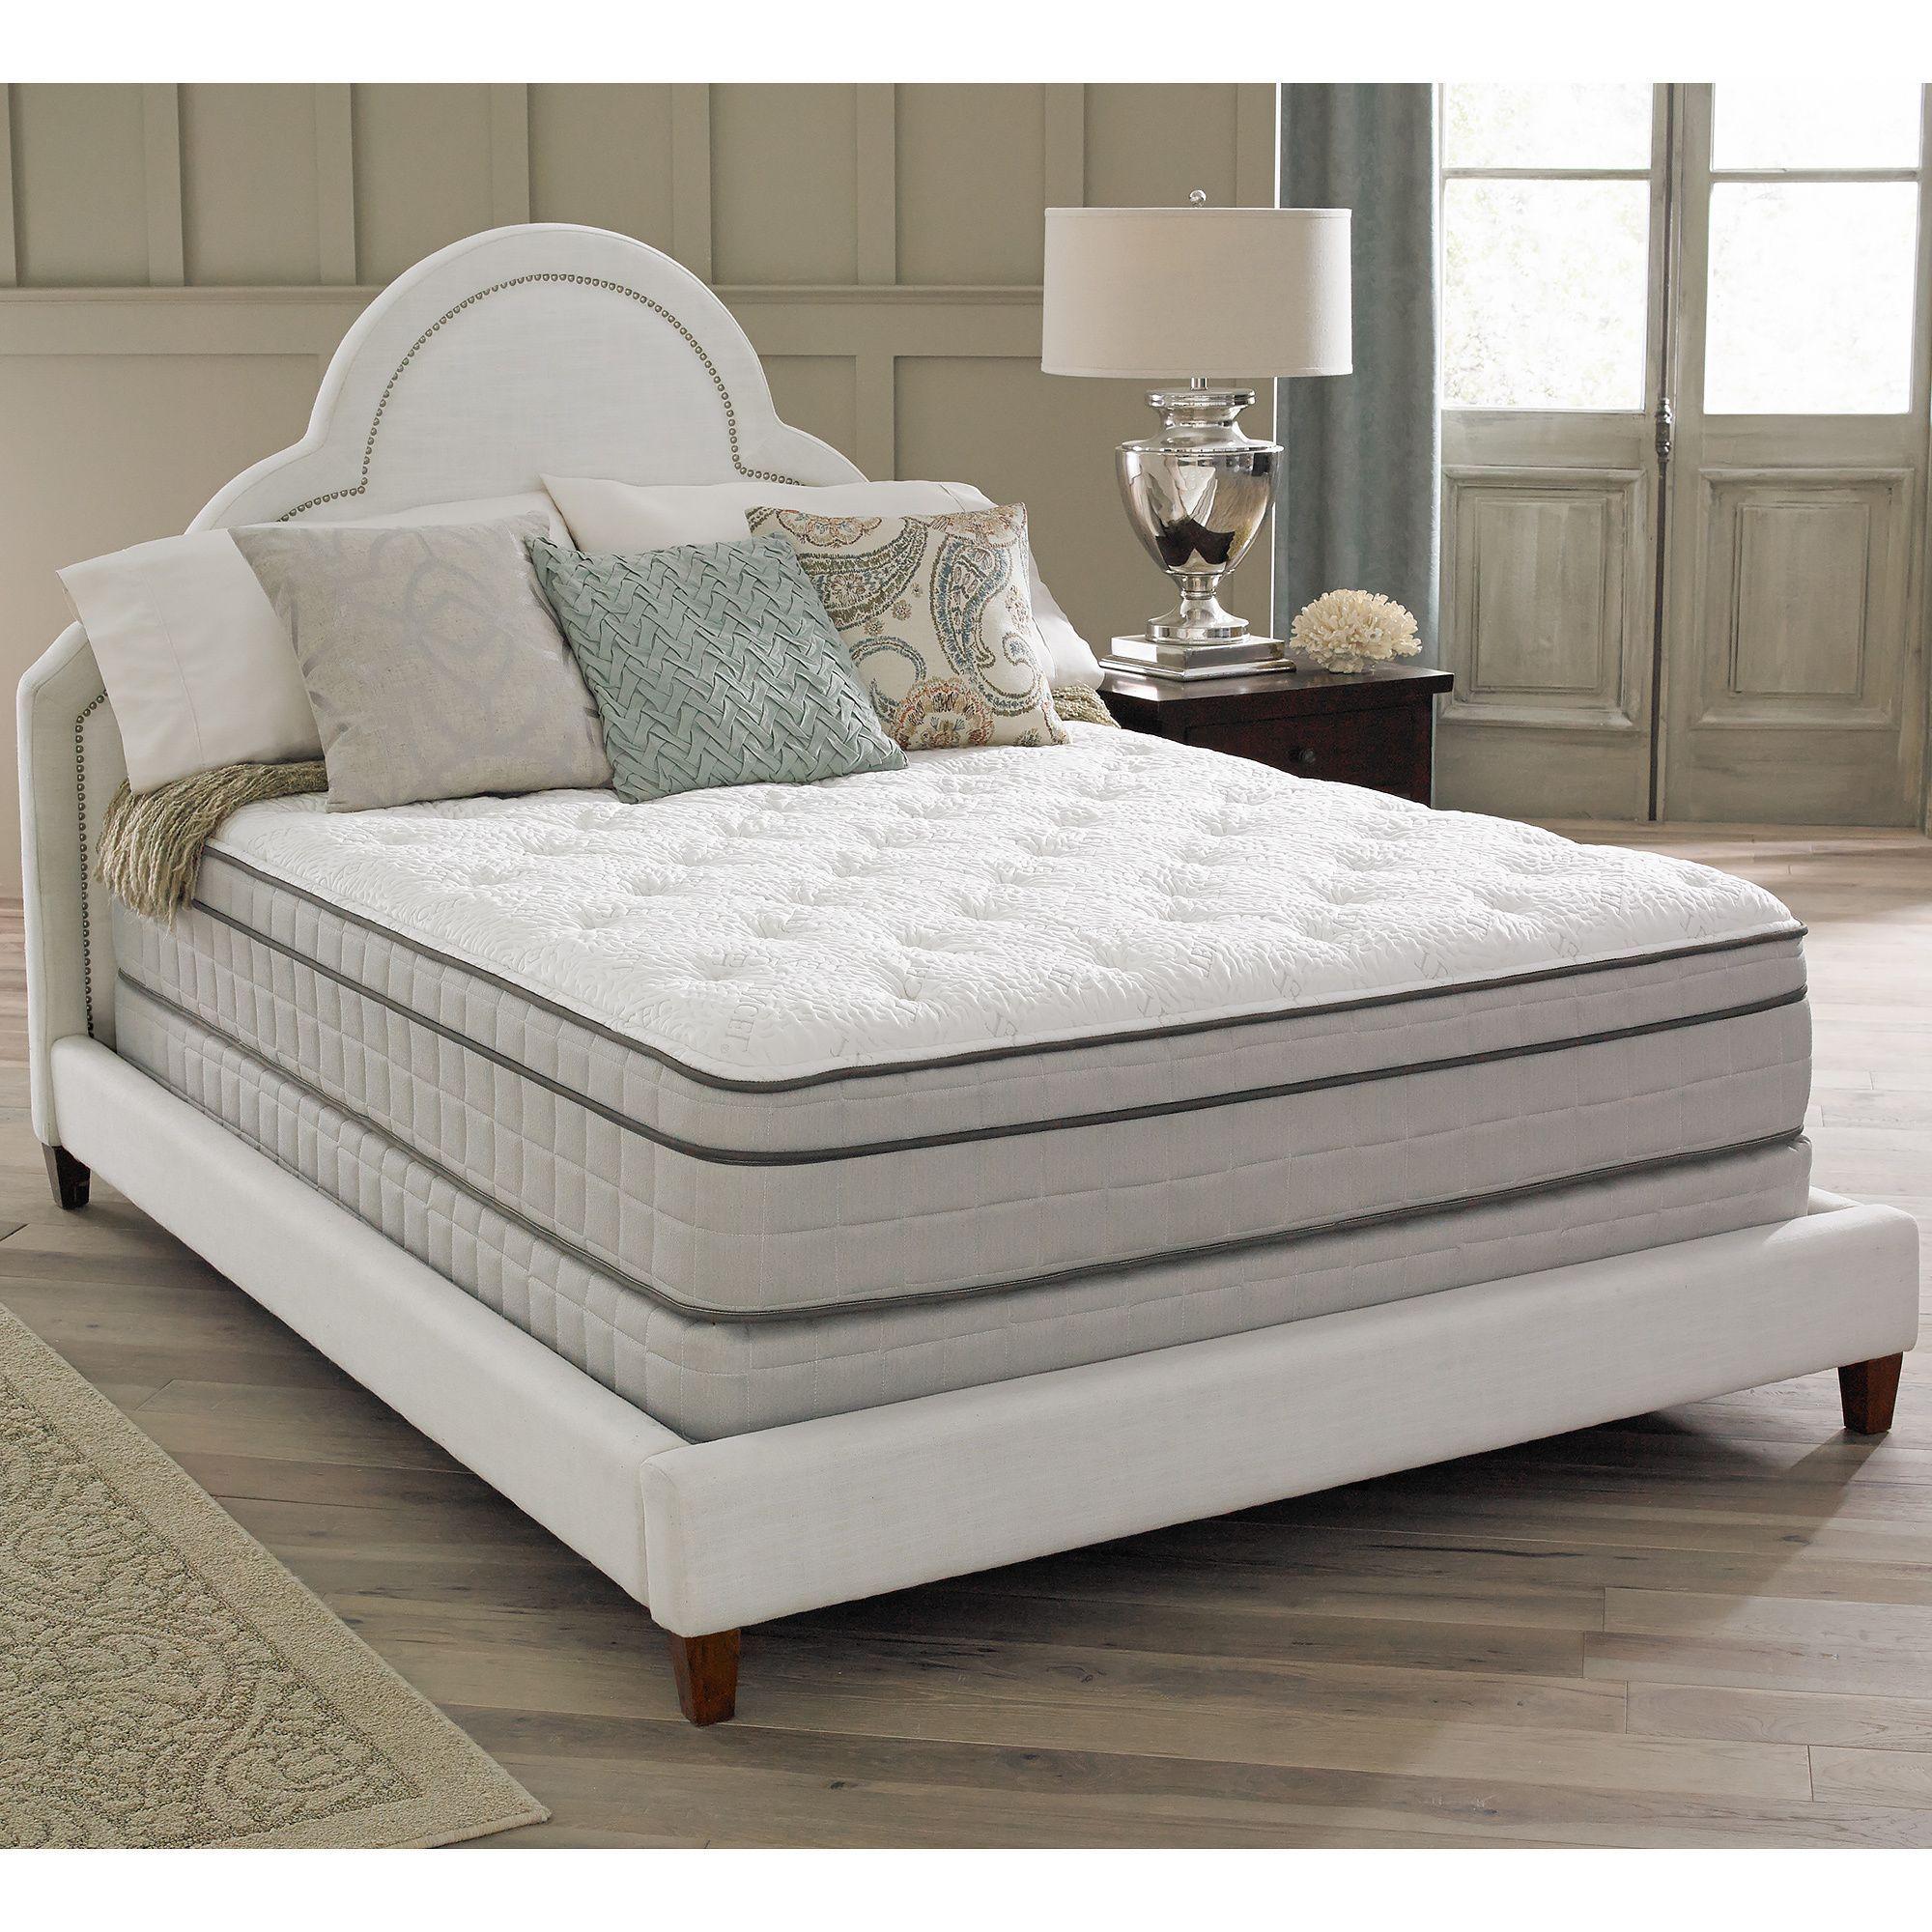 Spring Air Premium Collection Antoinette Pillow Top Queen Size